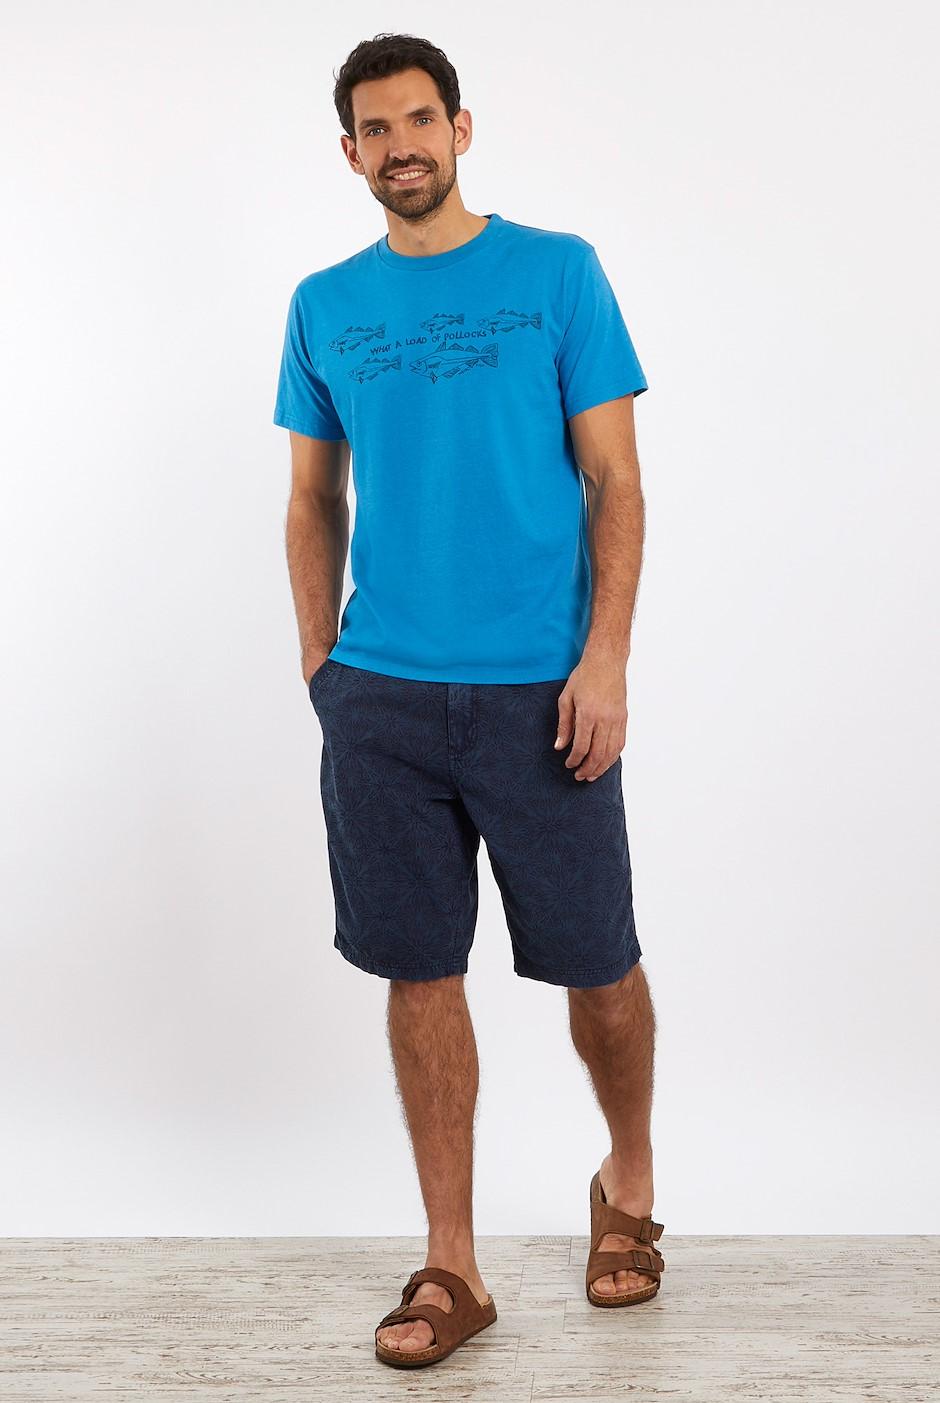 Pollock Organic Cotton Graphic T-Shirt Blue Wash